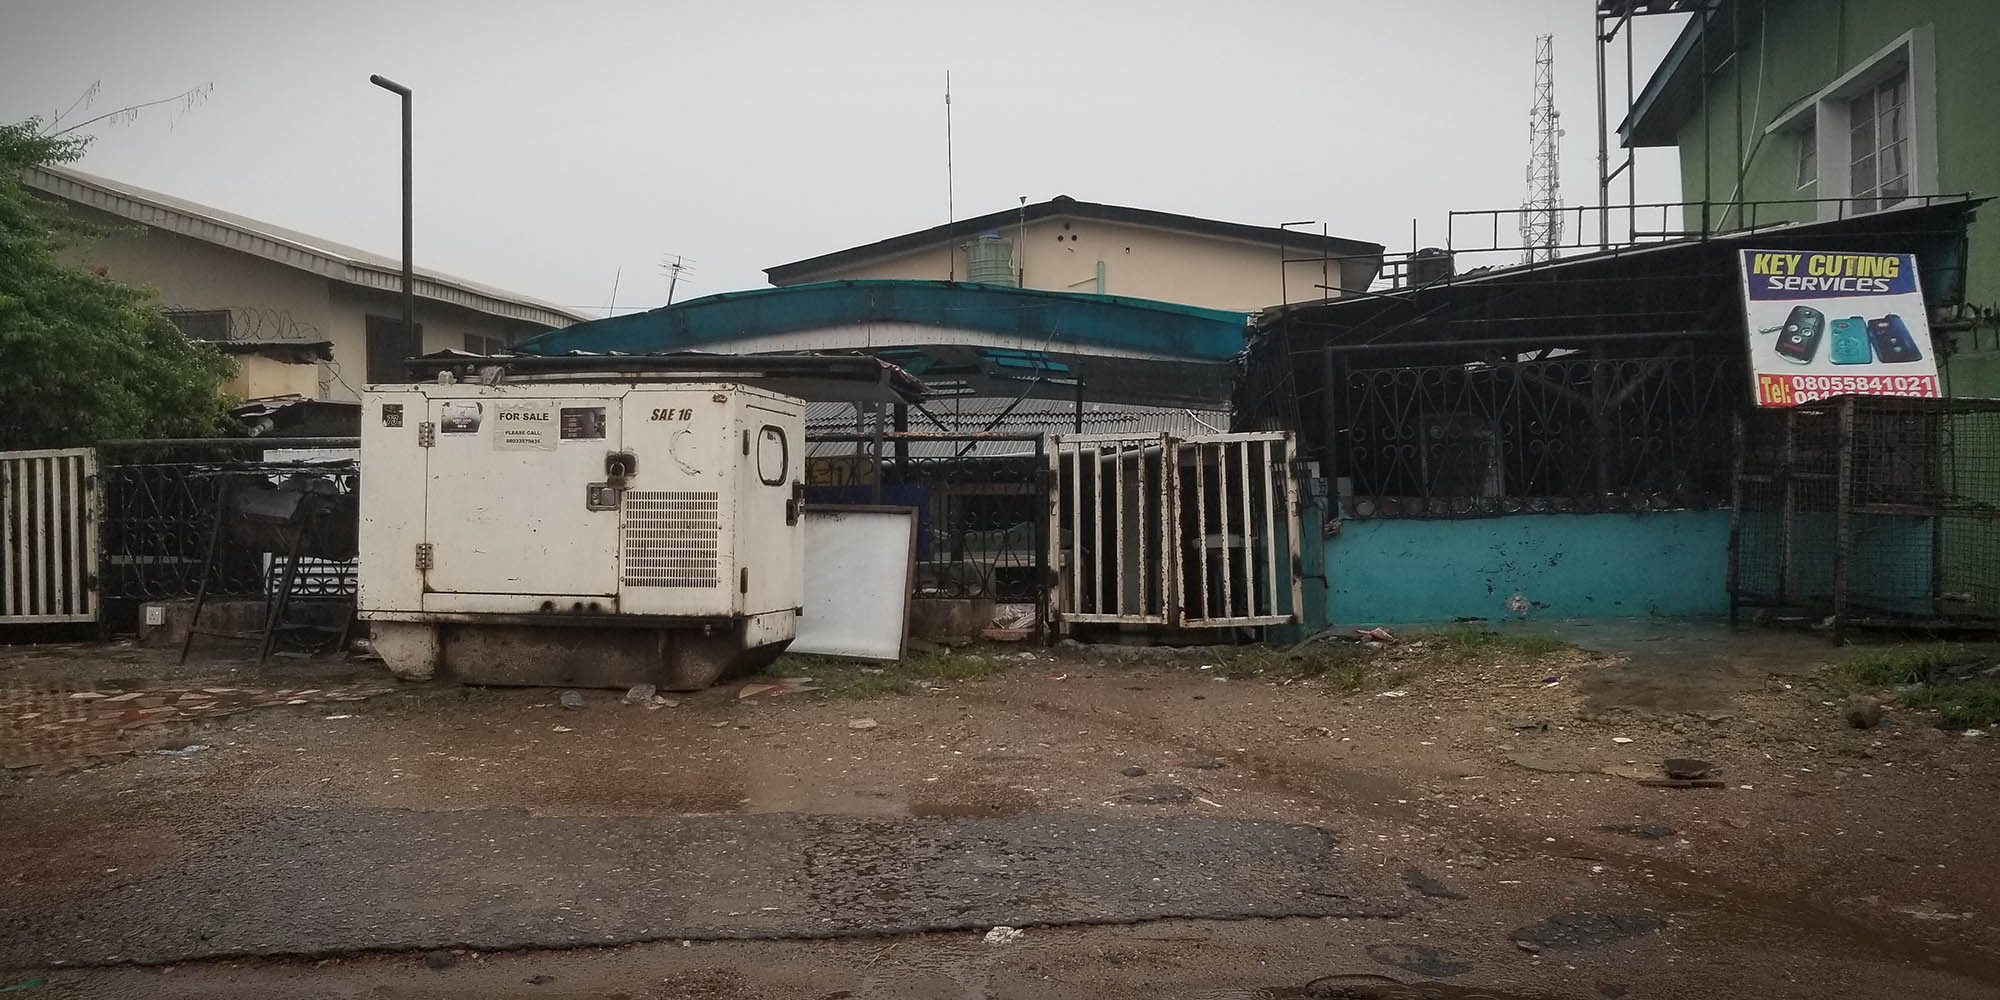 Nigeria's ever-present hum (of generators) - Daily Maverick